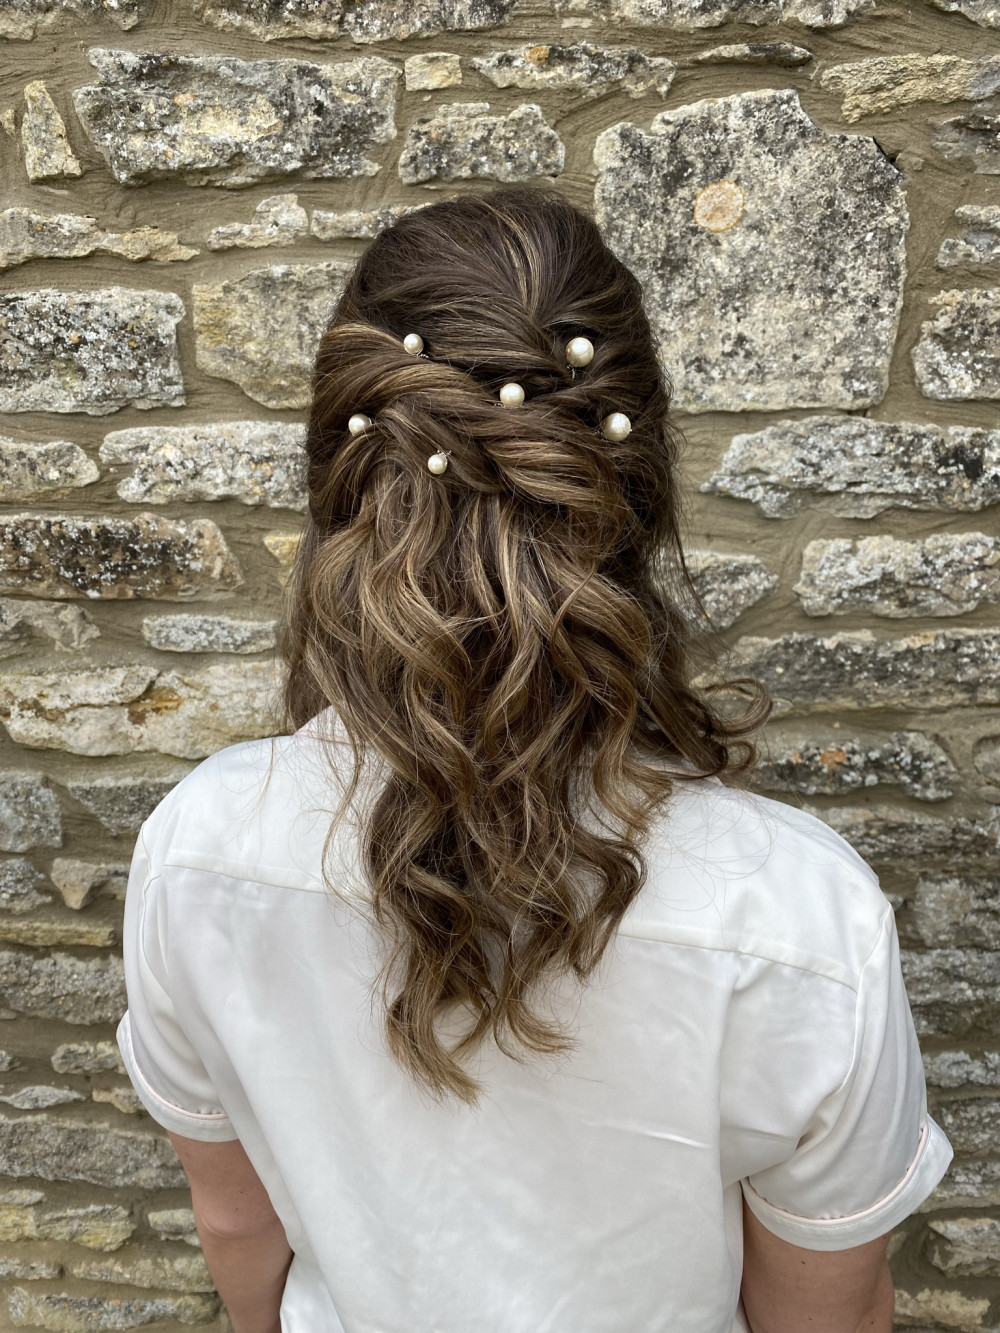 - Make Me Bridal Artist: Celfie Hair and Makeup. #bridalhair #bridalhairstylist #bridalhairandmakeup #bohobride #bohowedding #bohohair